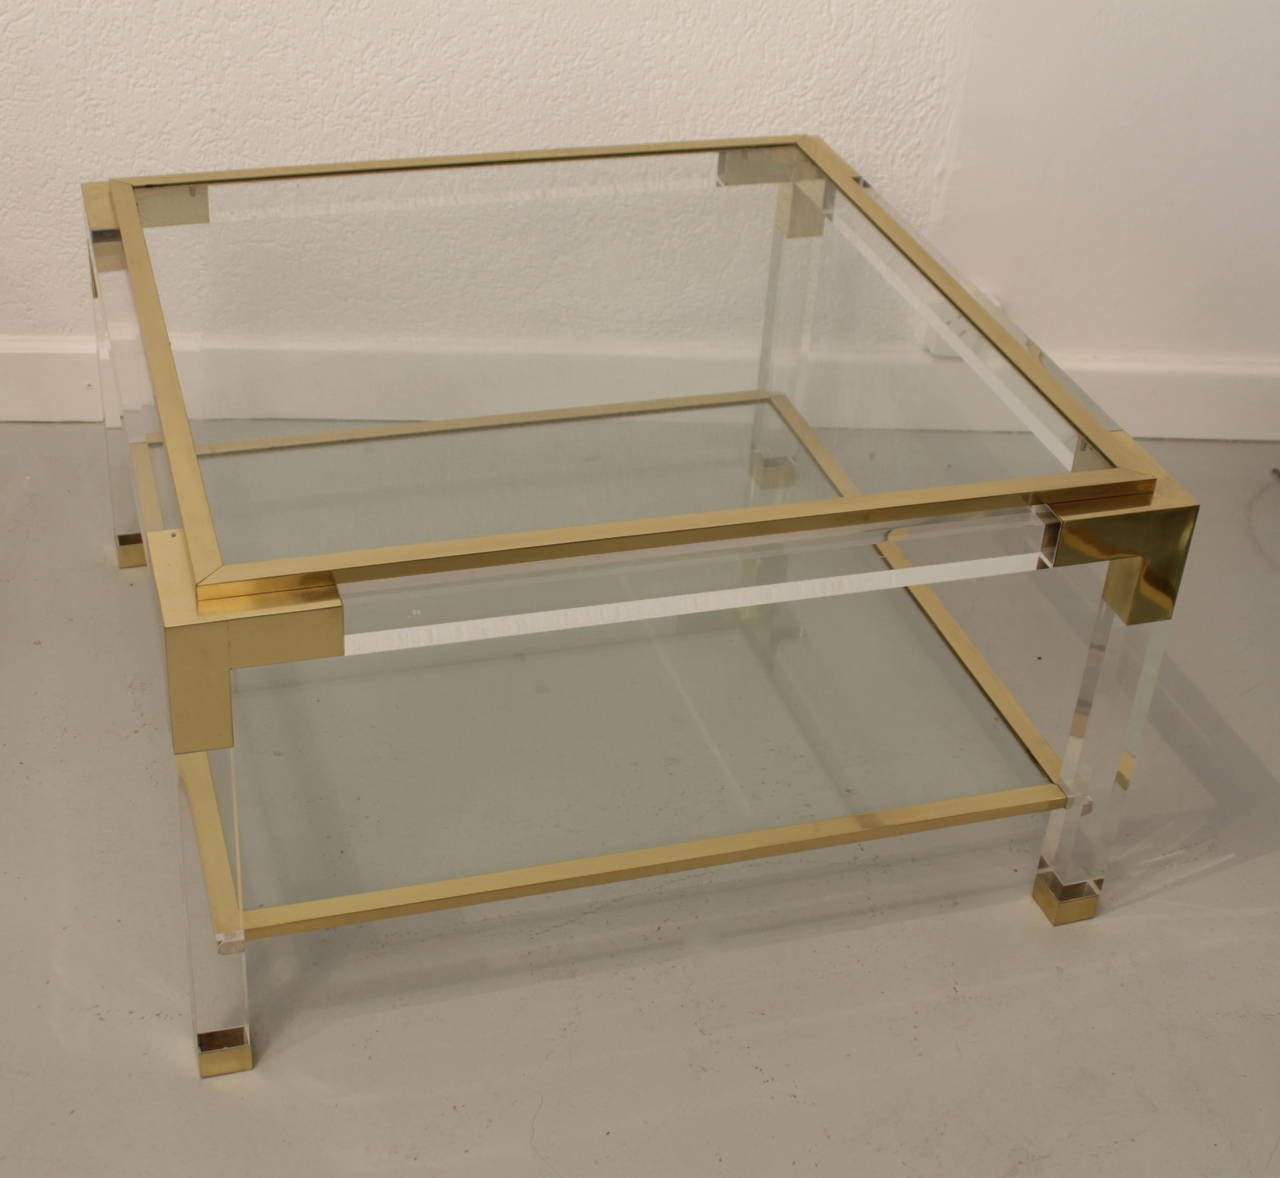 Quadratischer Messing & Plexiglass Couchtisch, 1975